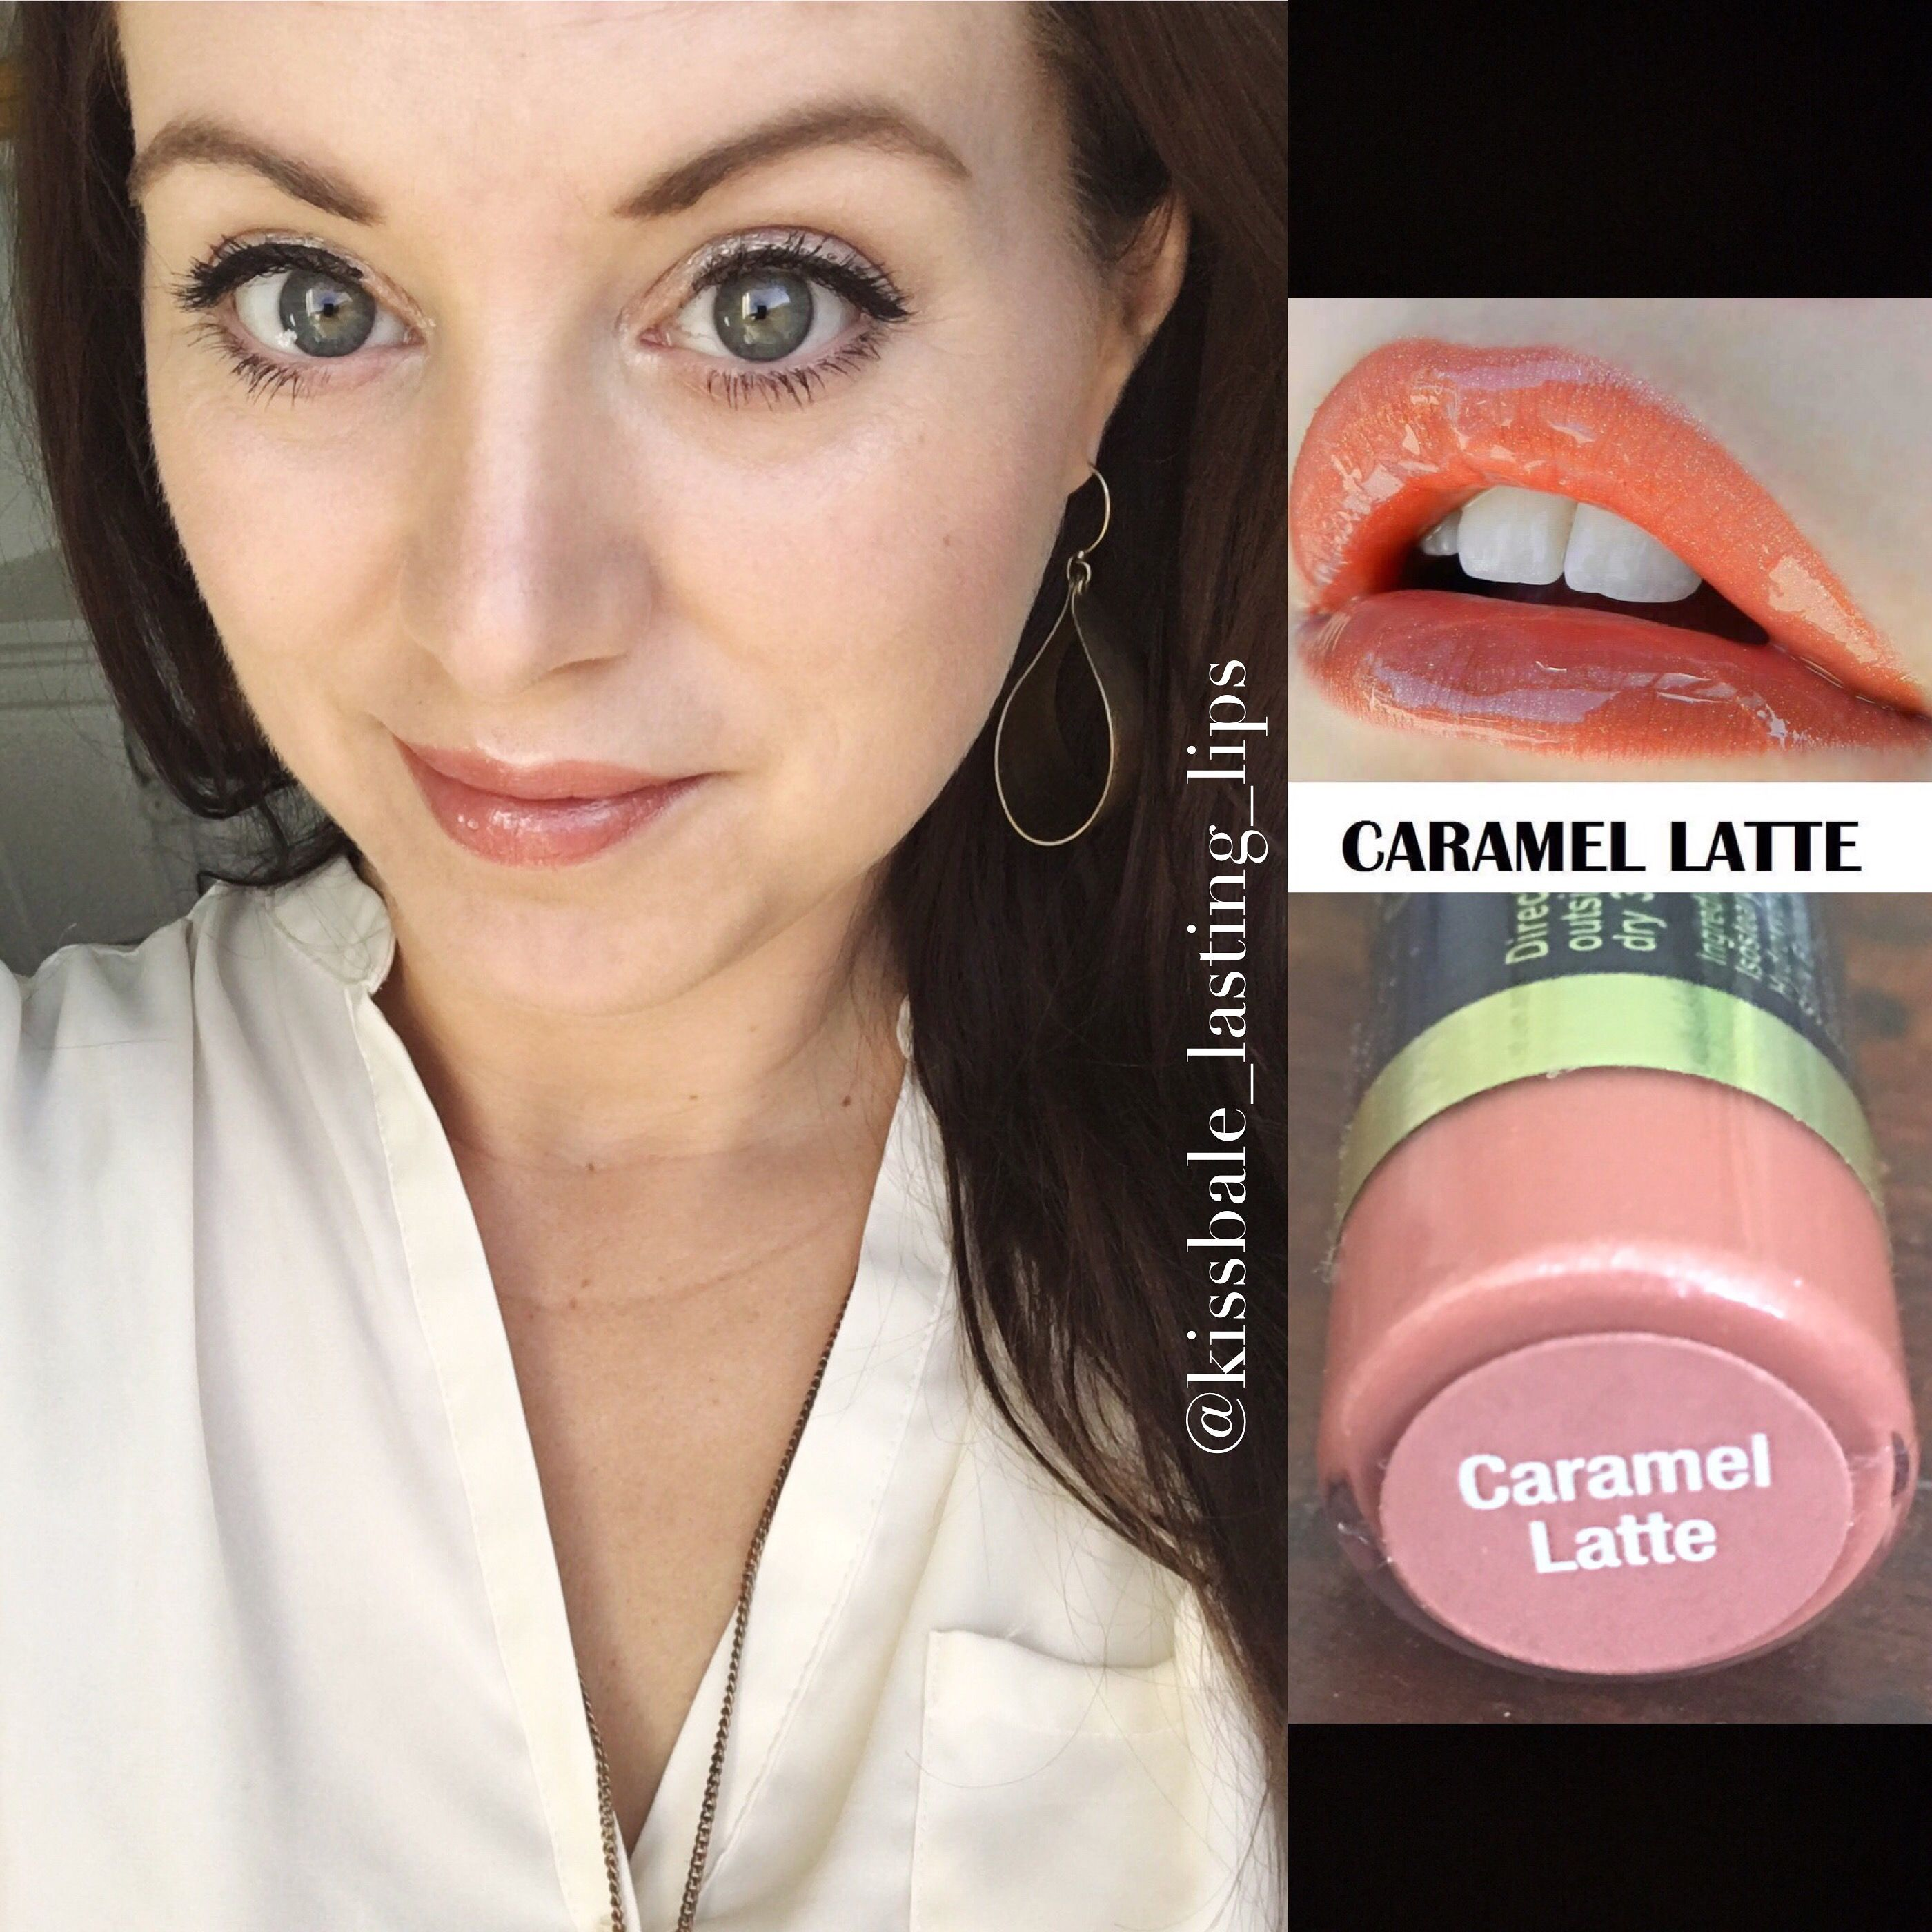 Carmel Latte LipSense Glossy Gloss Https://m.facebook.com